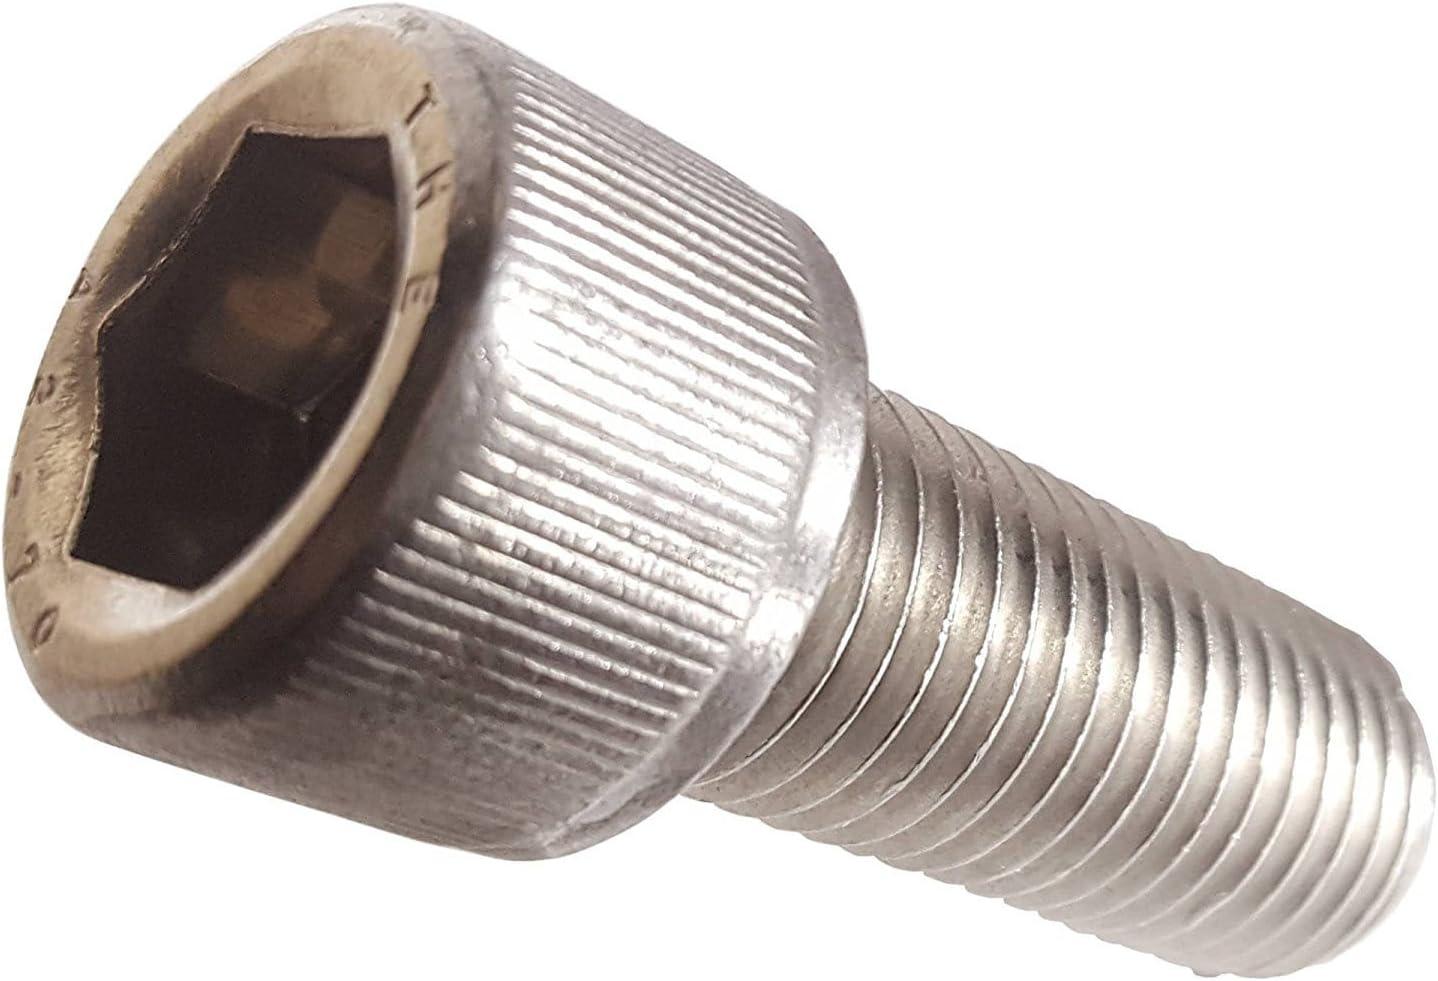 Holo-Krome Internal Wrenching Allen Nuts 3//4-10 Hex Socket Drive r Plain 250pcs Steel Brand Ships FREE in USA by Aspen Fasteners Recess=3//4